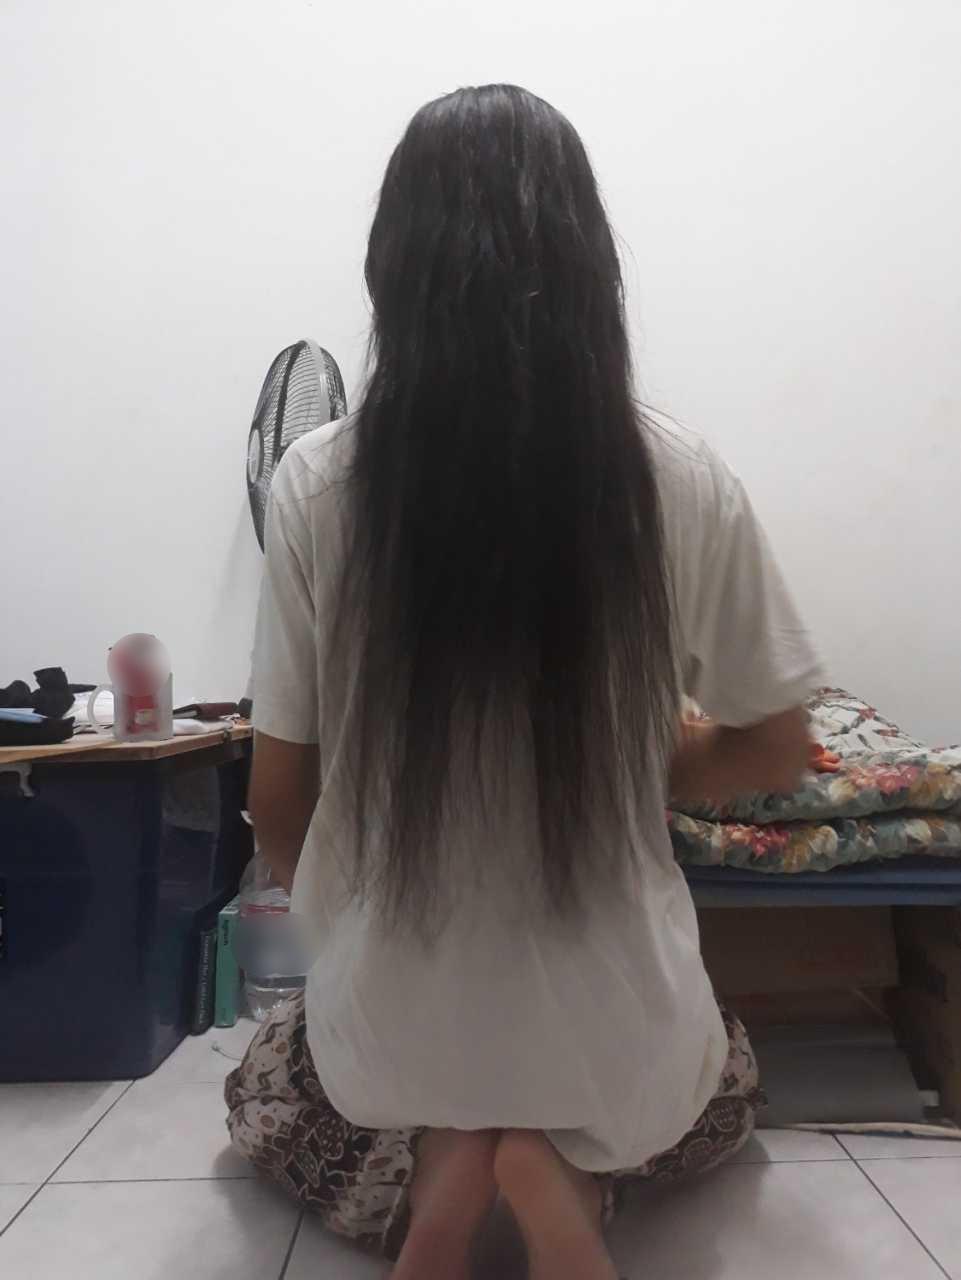 Jangan Bebel Rambut Isteri Banyak Di Lantai, Itu Tanda Mereka Penat Perlu Rehat